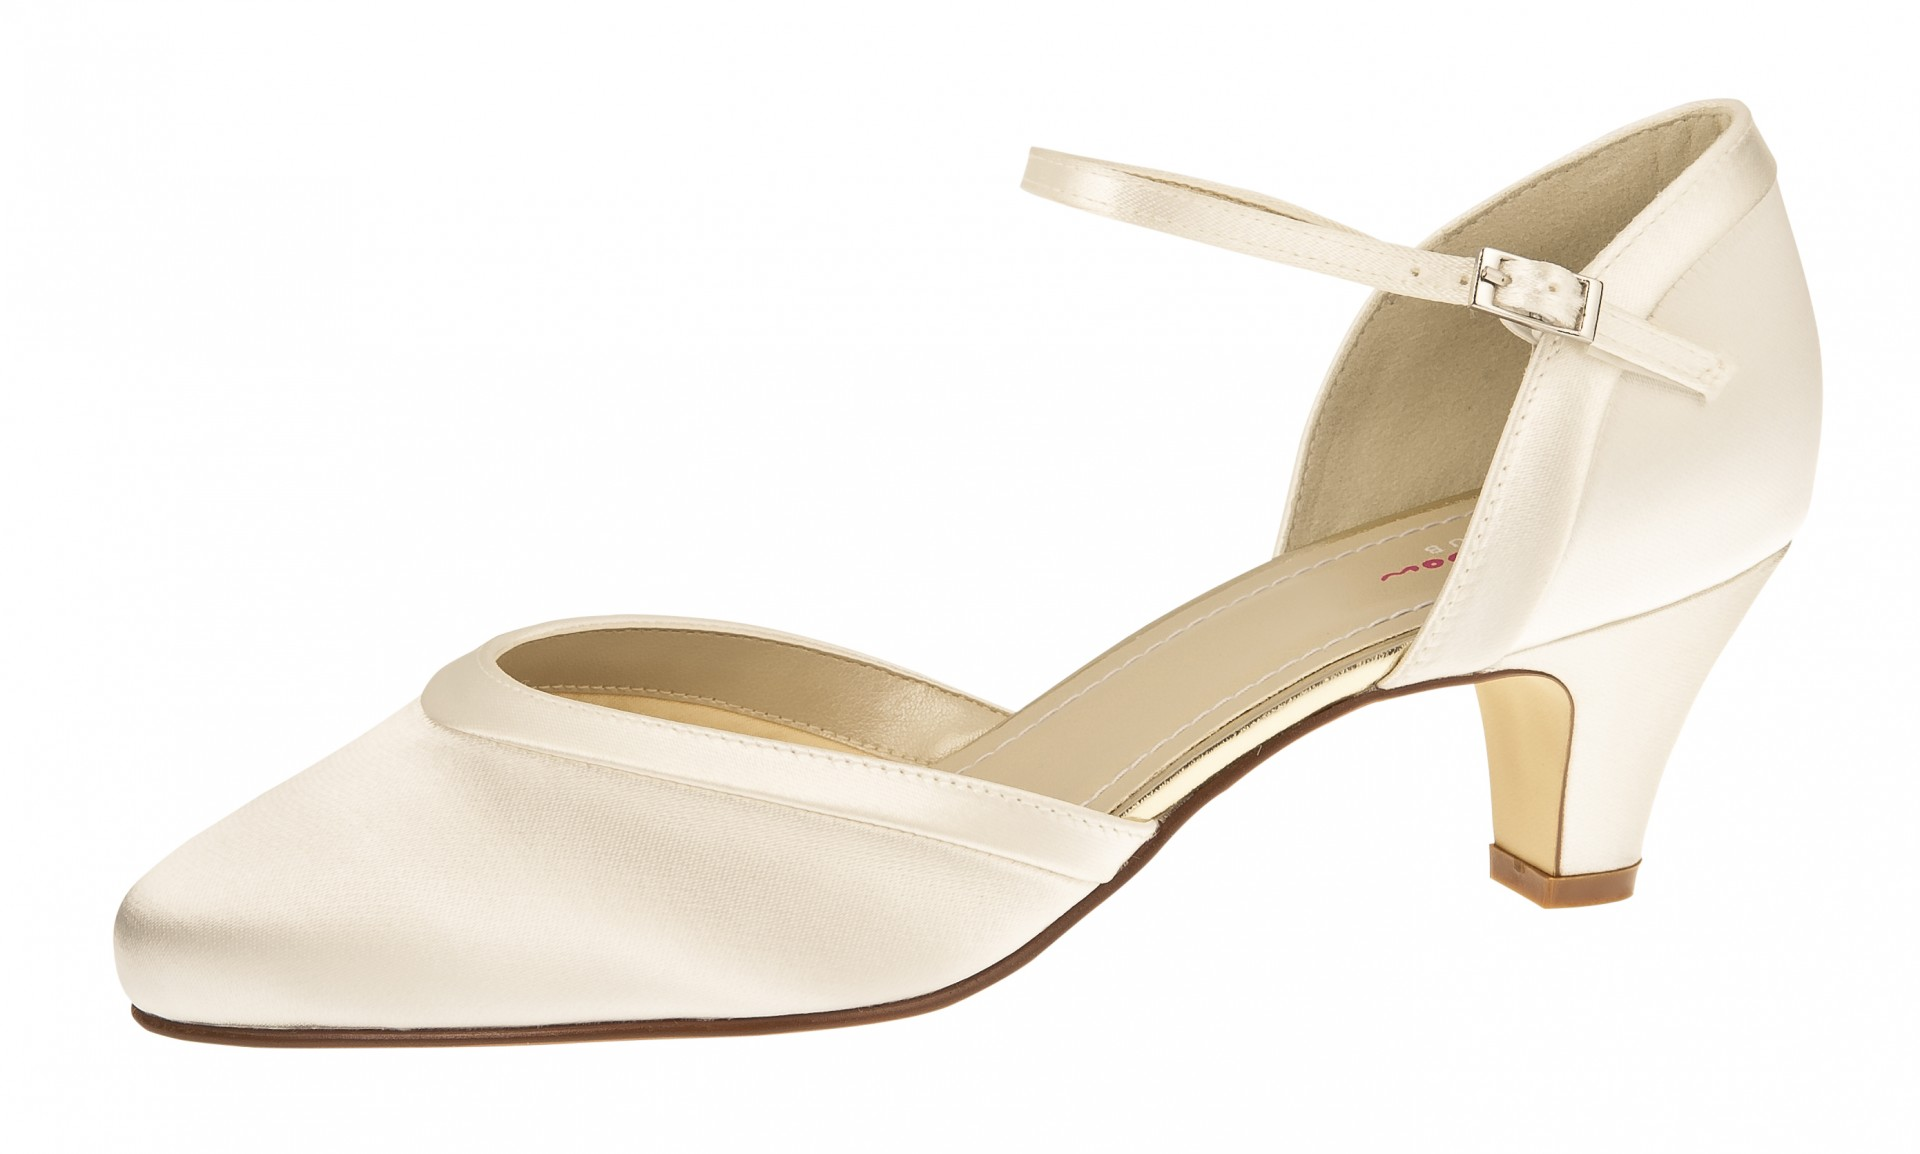 Elsa Coloured Shoes: Letty